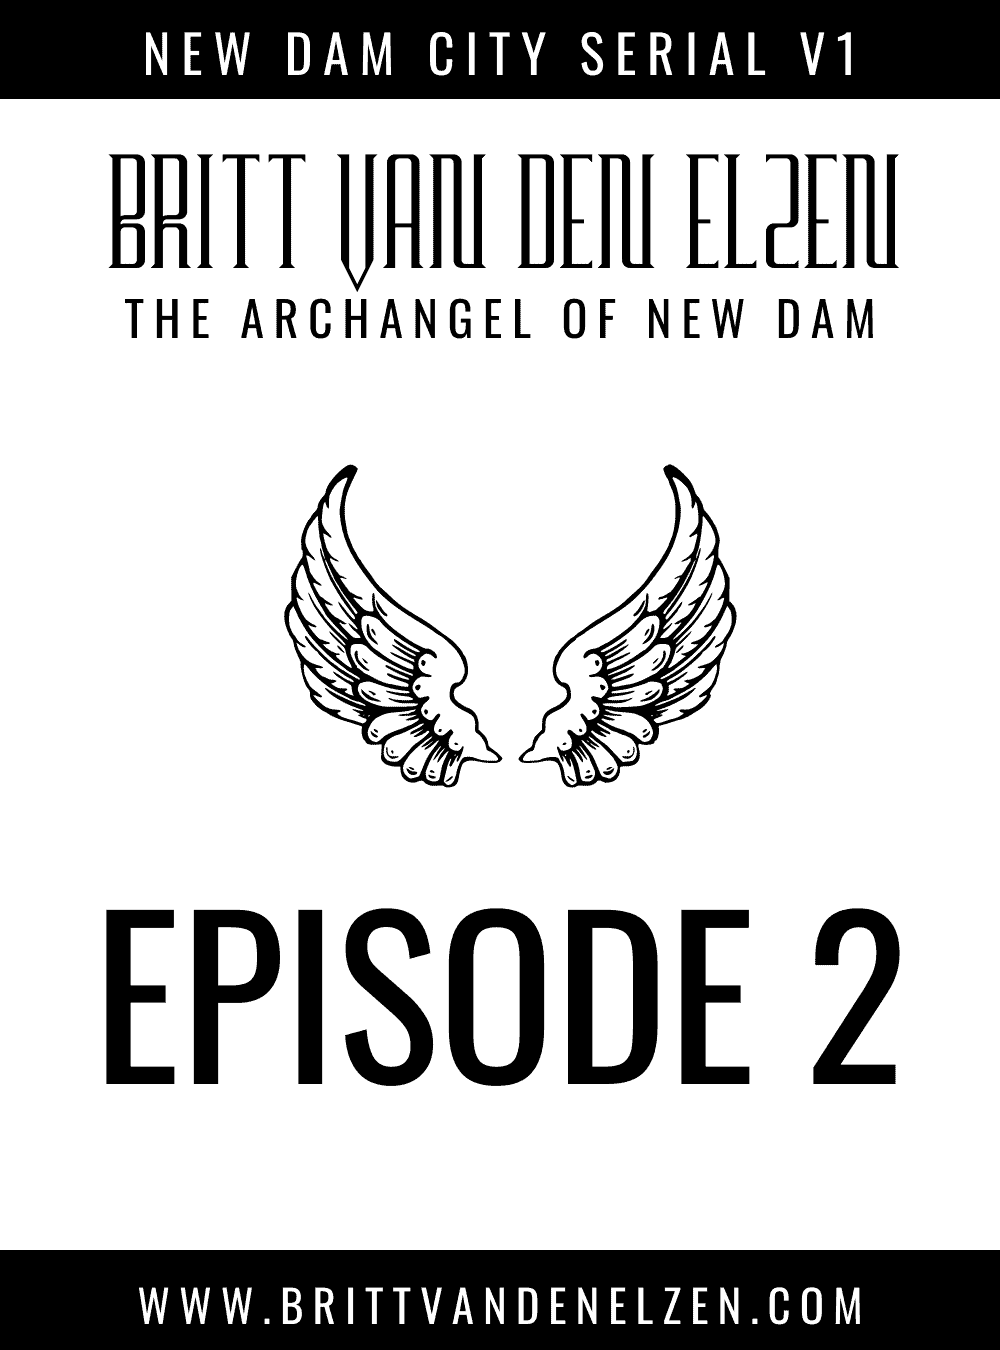 The Archangel of New Dam: Episode 2